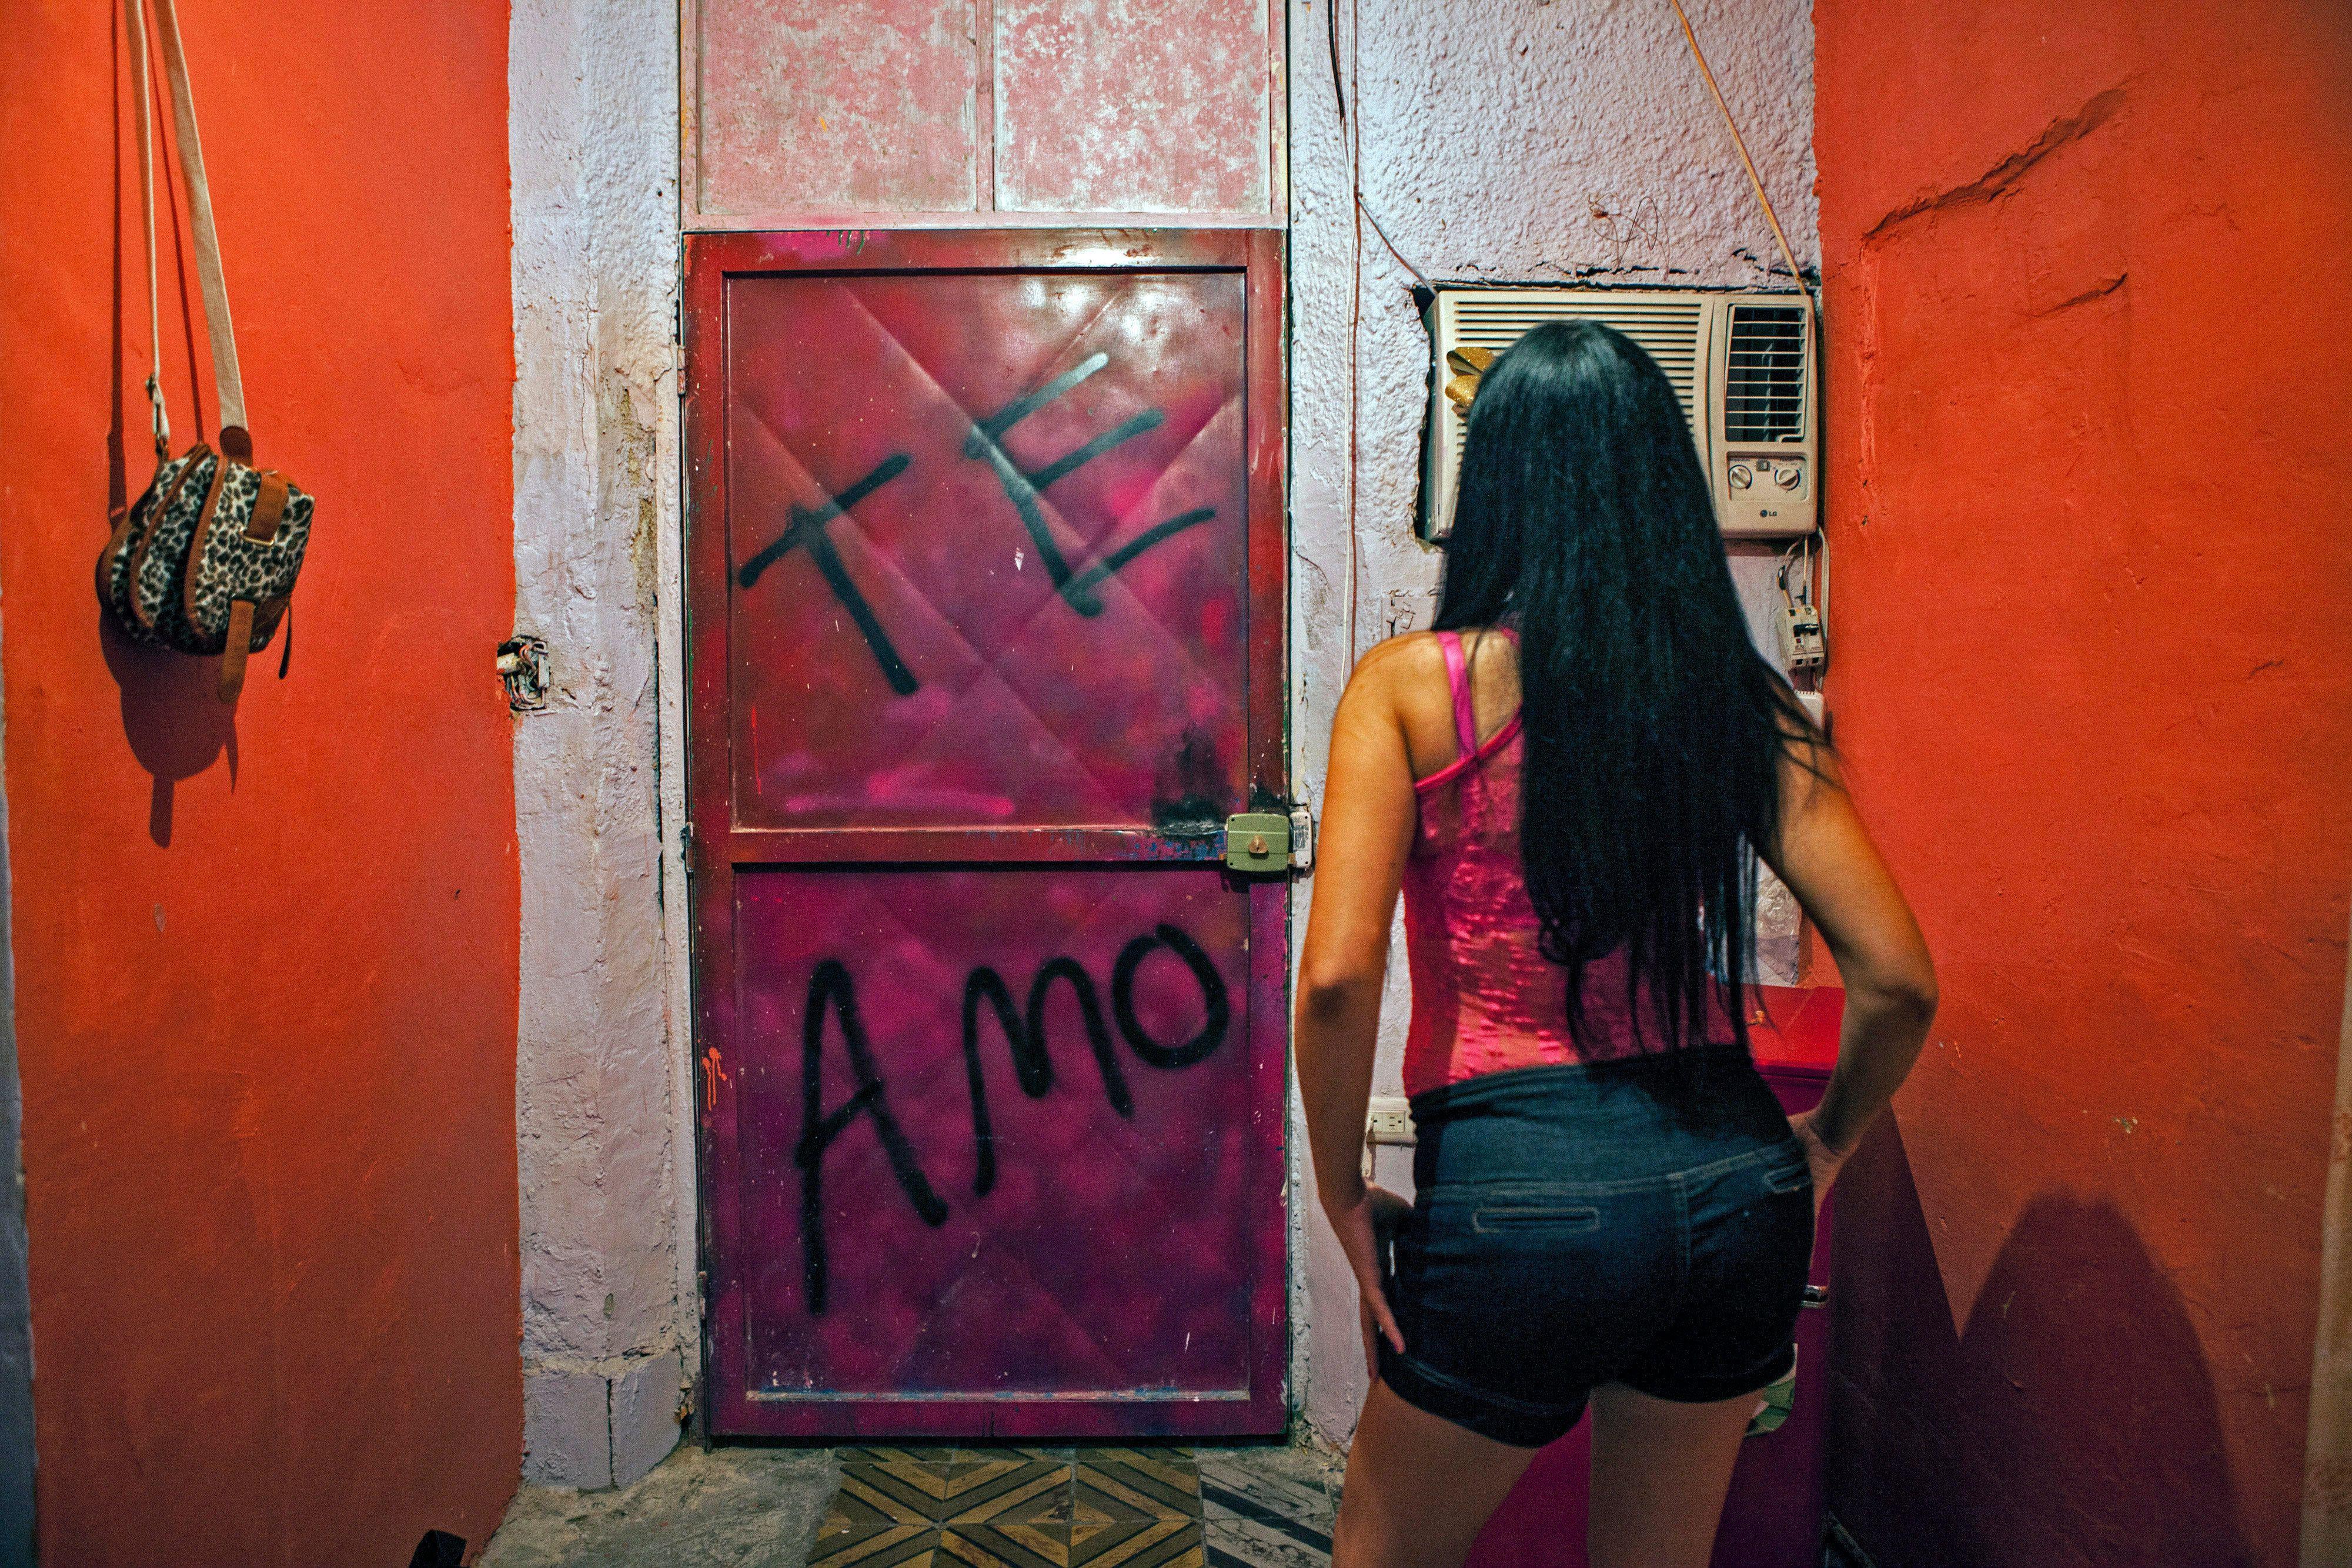 Teen girls Amol